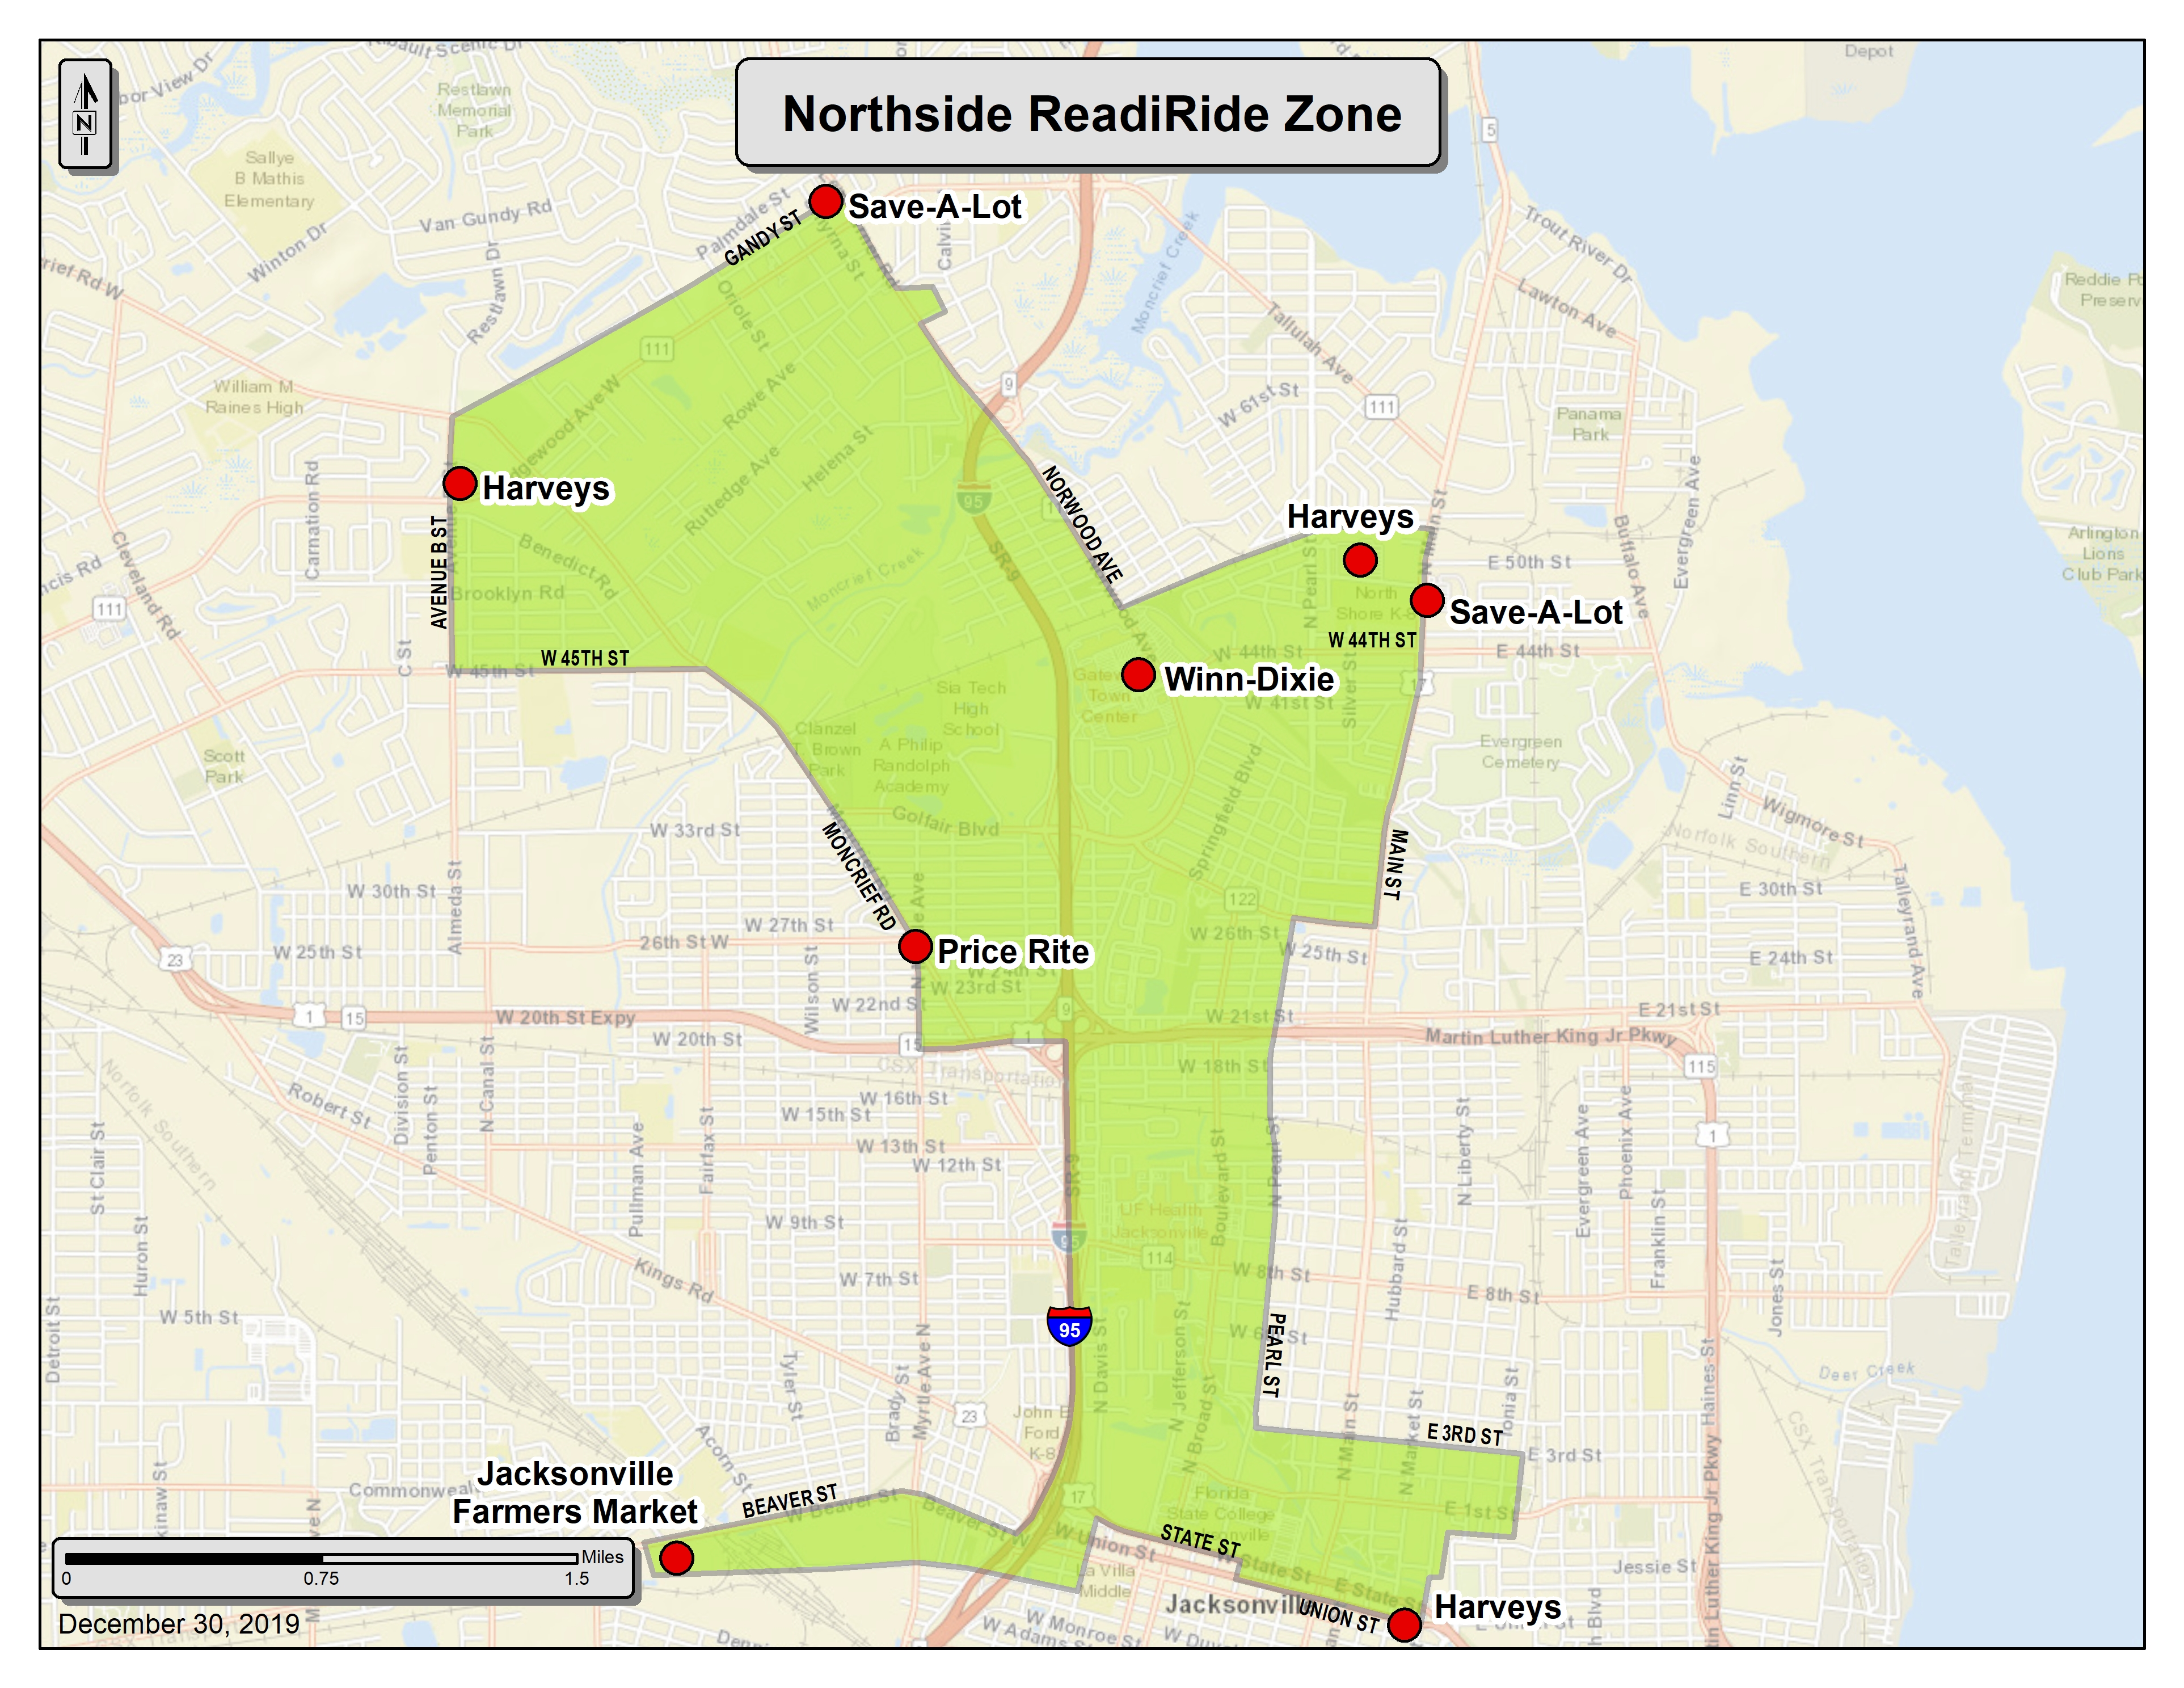 Northside ReadiRide Zone